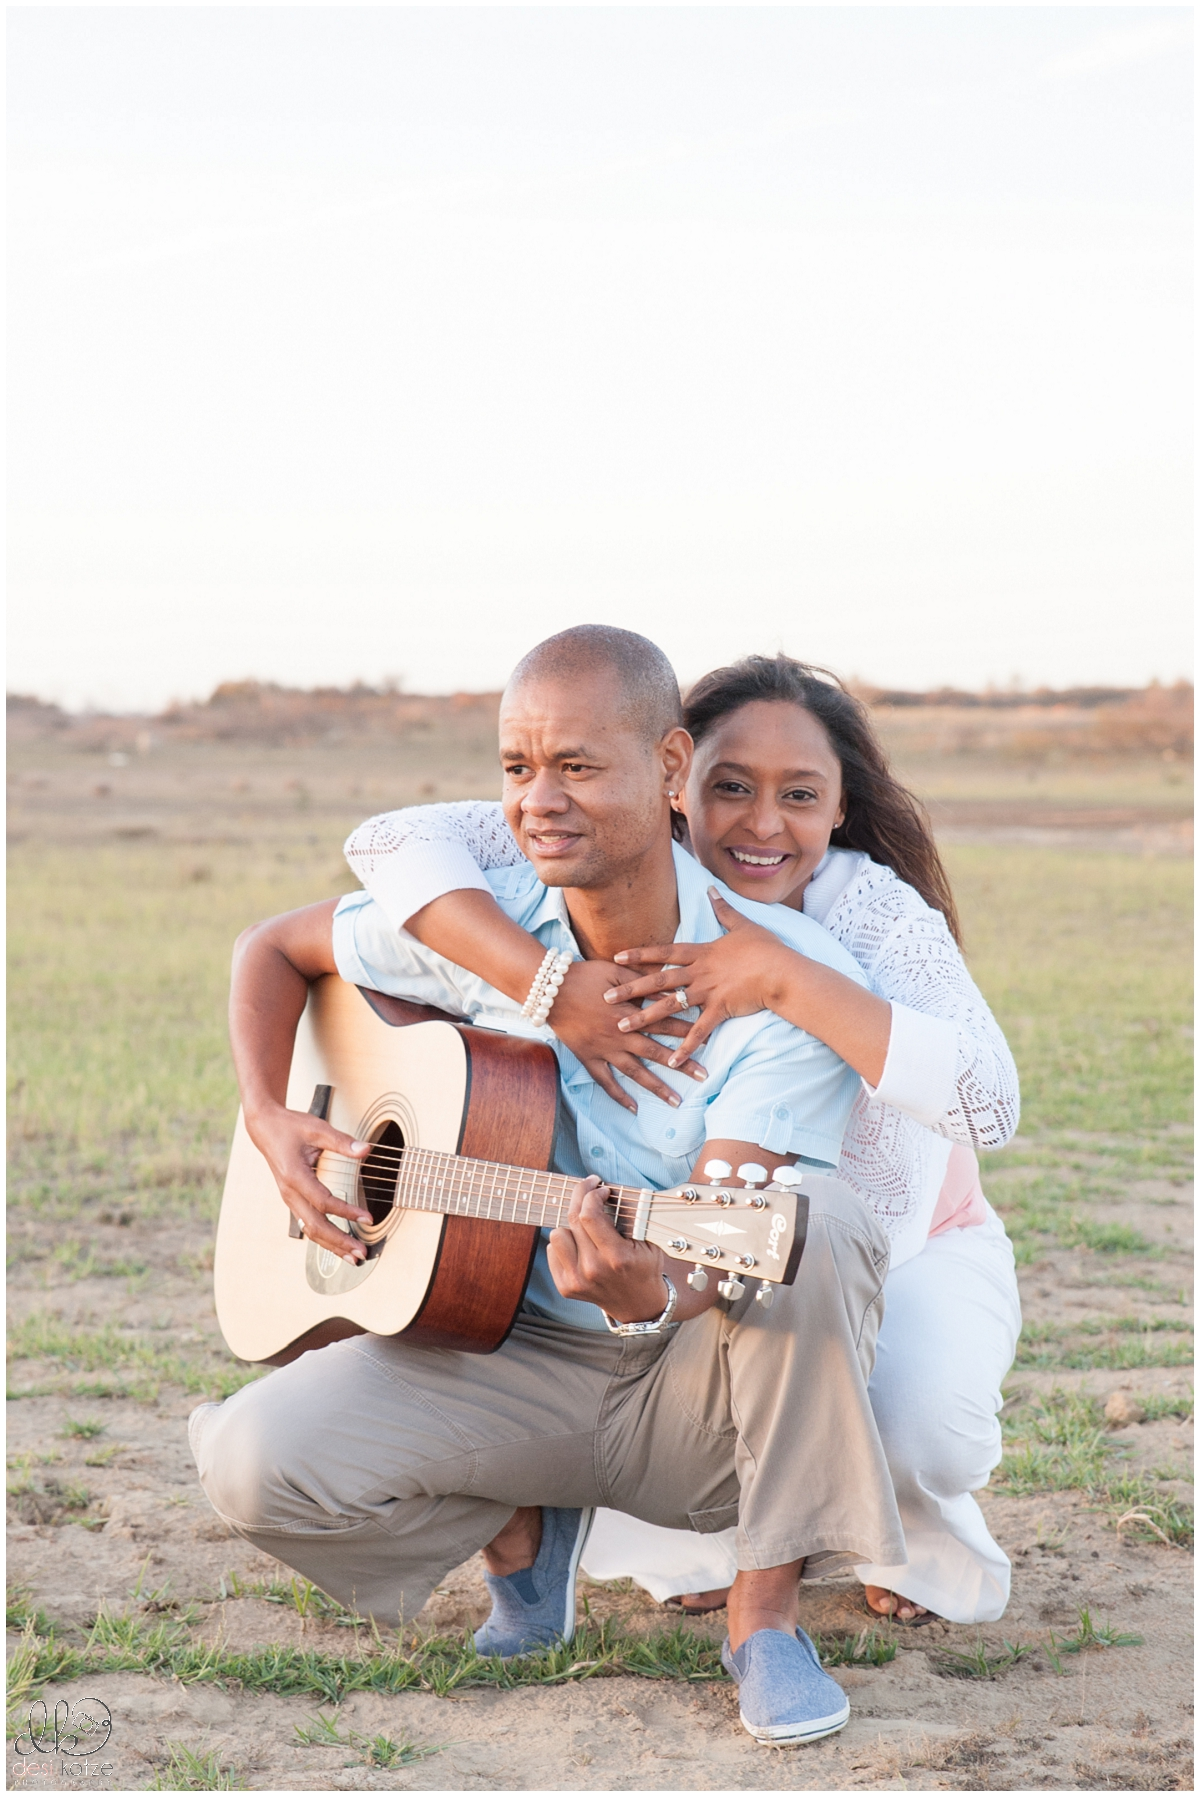 MC _Desi Kotze_Engagement 18